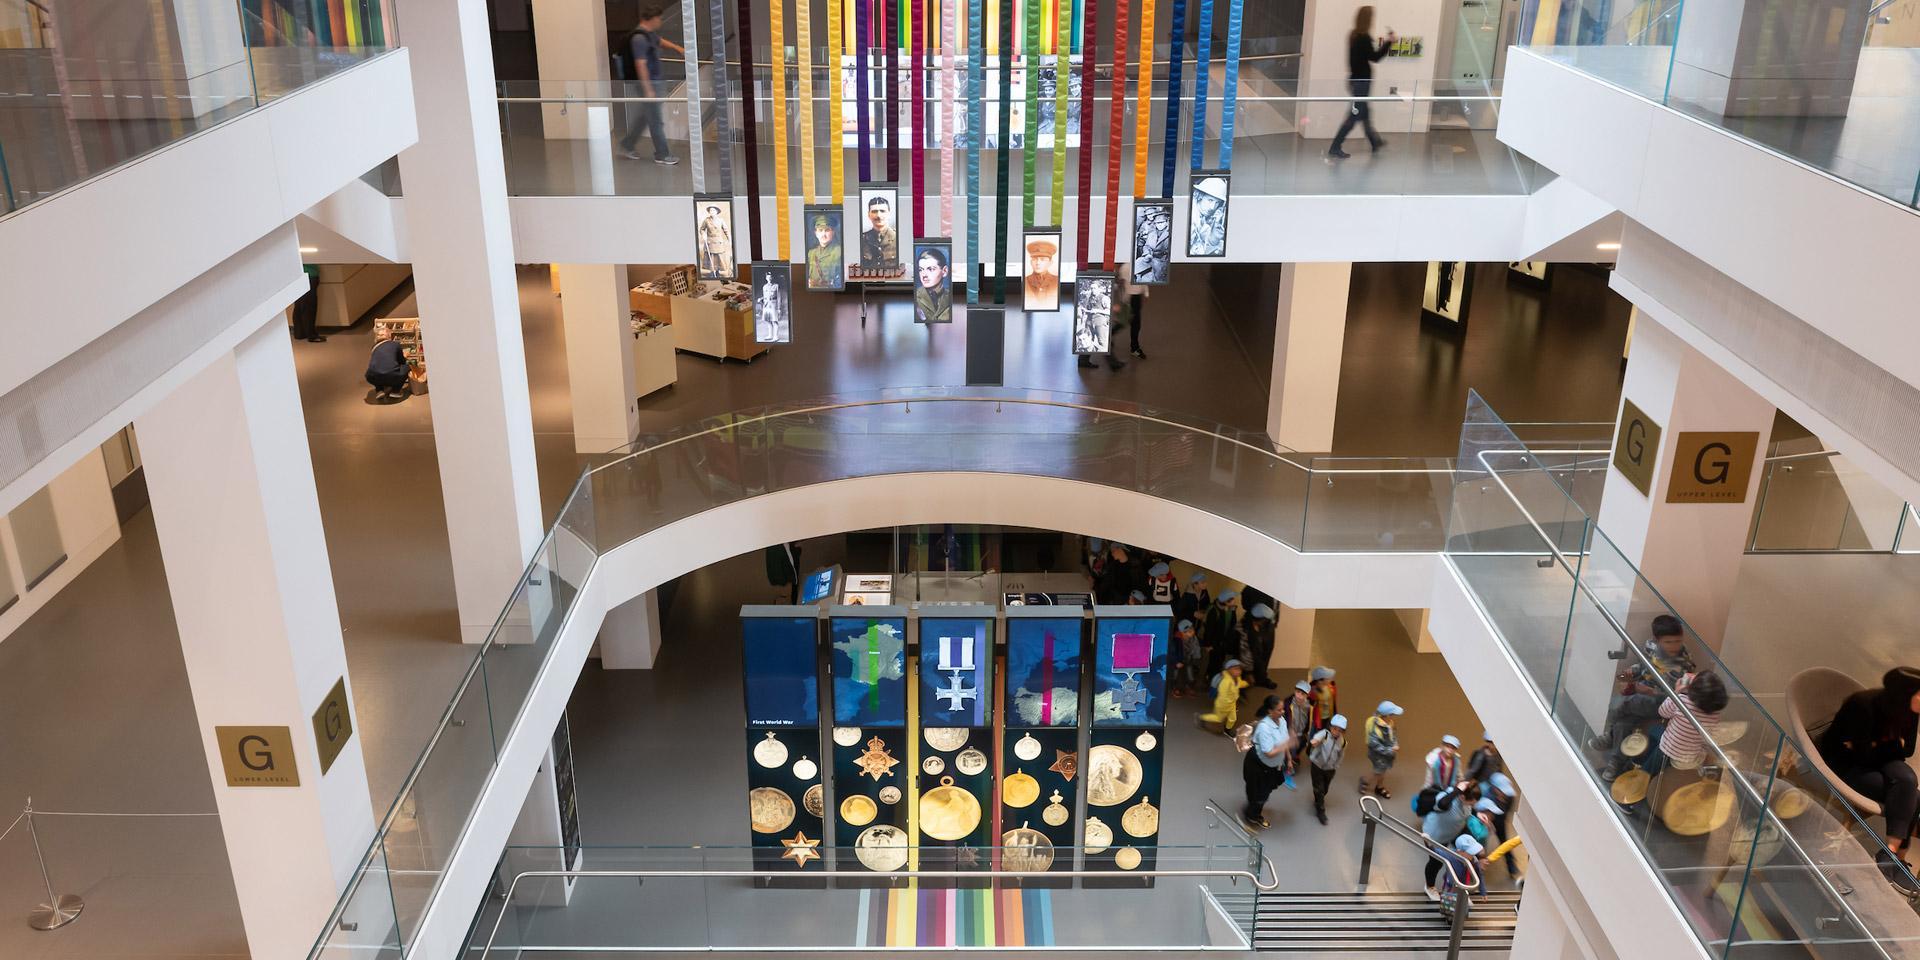 Ribbon display in the atrium